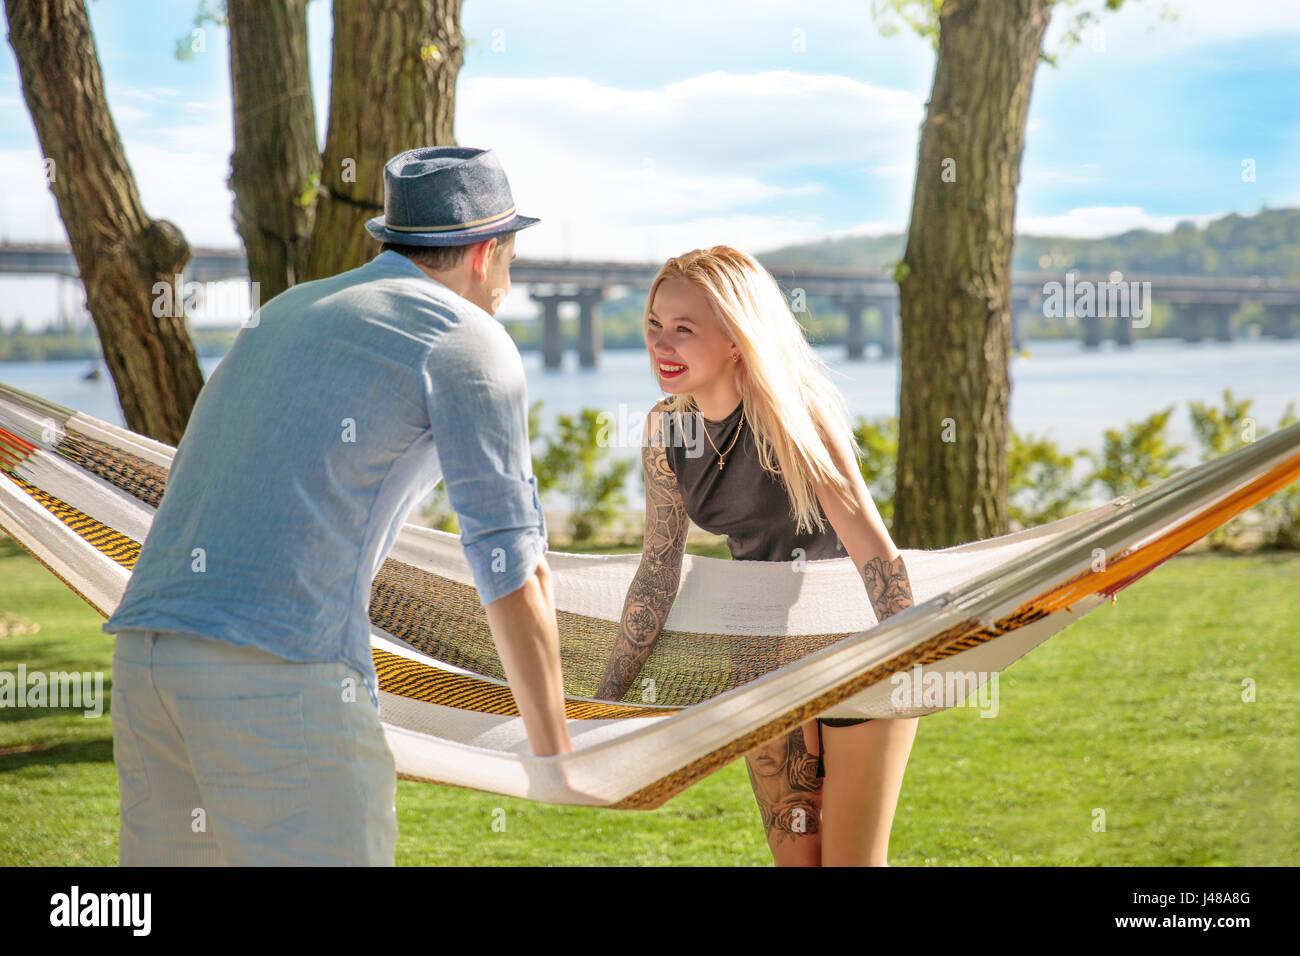 Picture of romantic couple near hammock - Stock Image